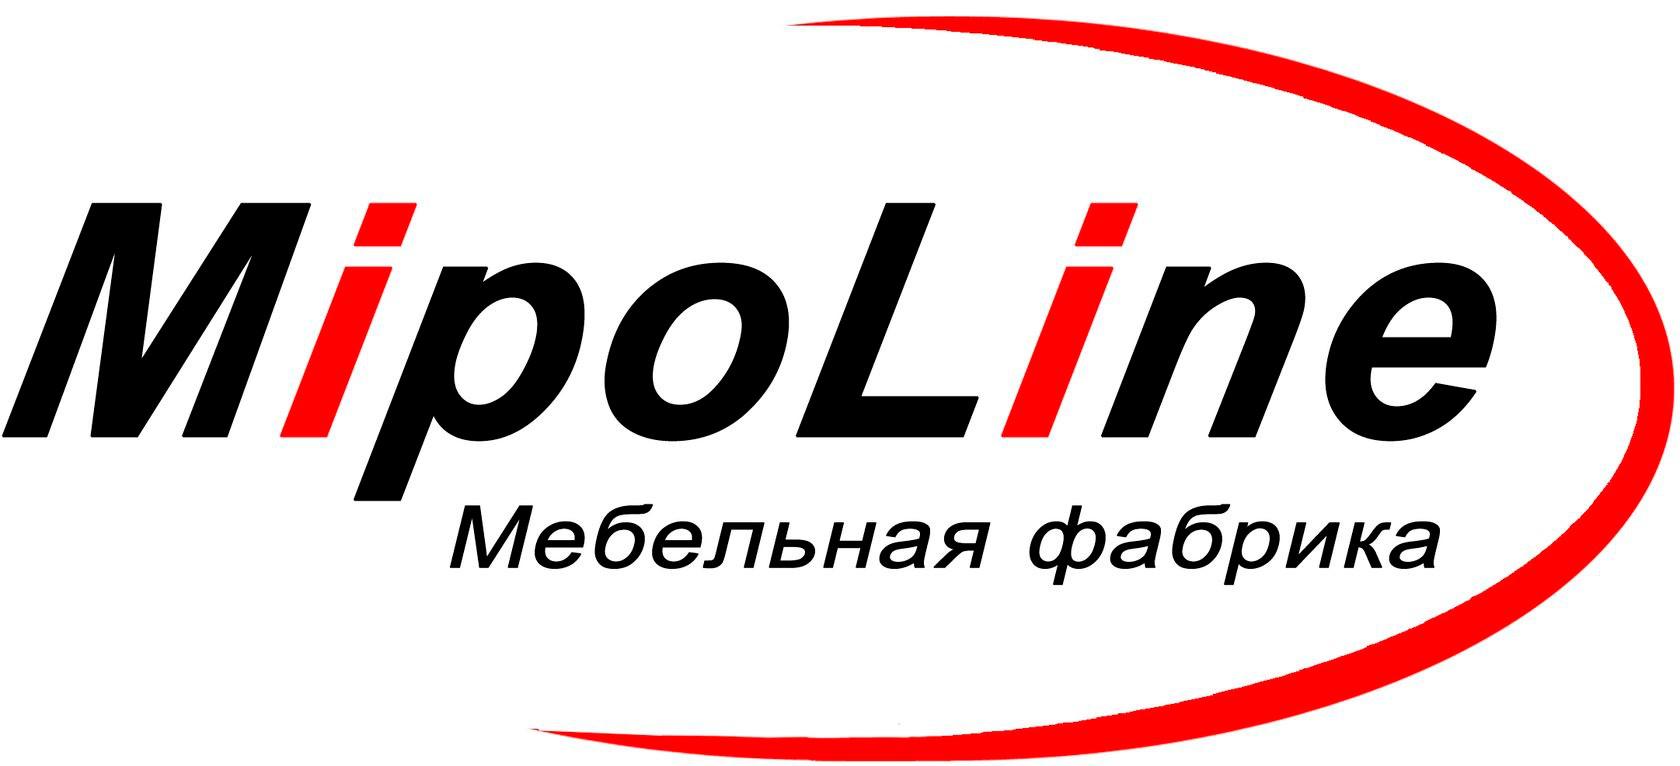 Мебельная фабрика MipoLine